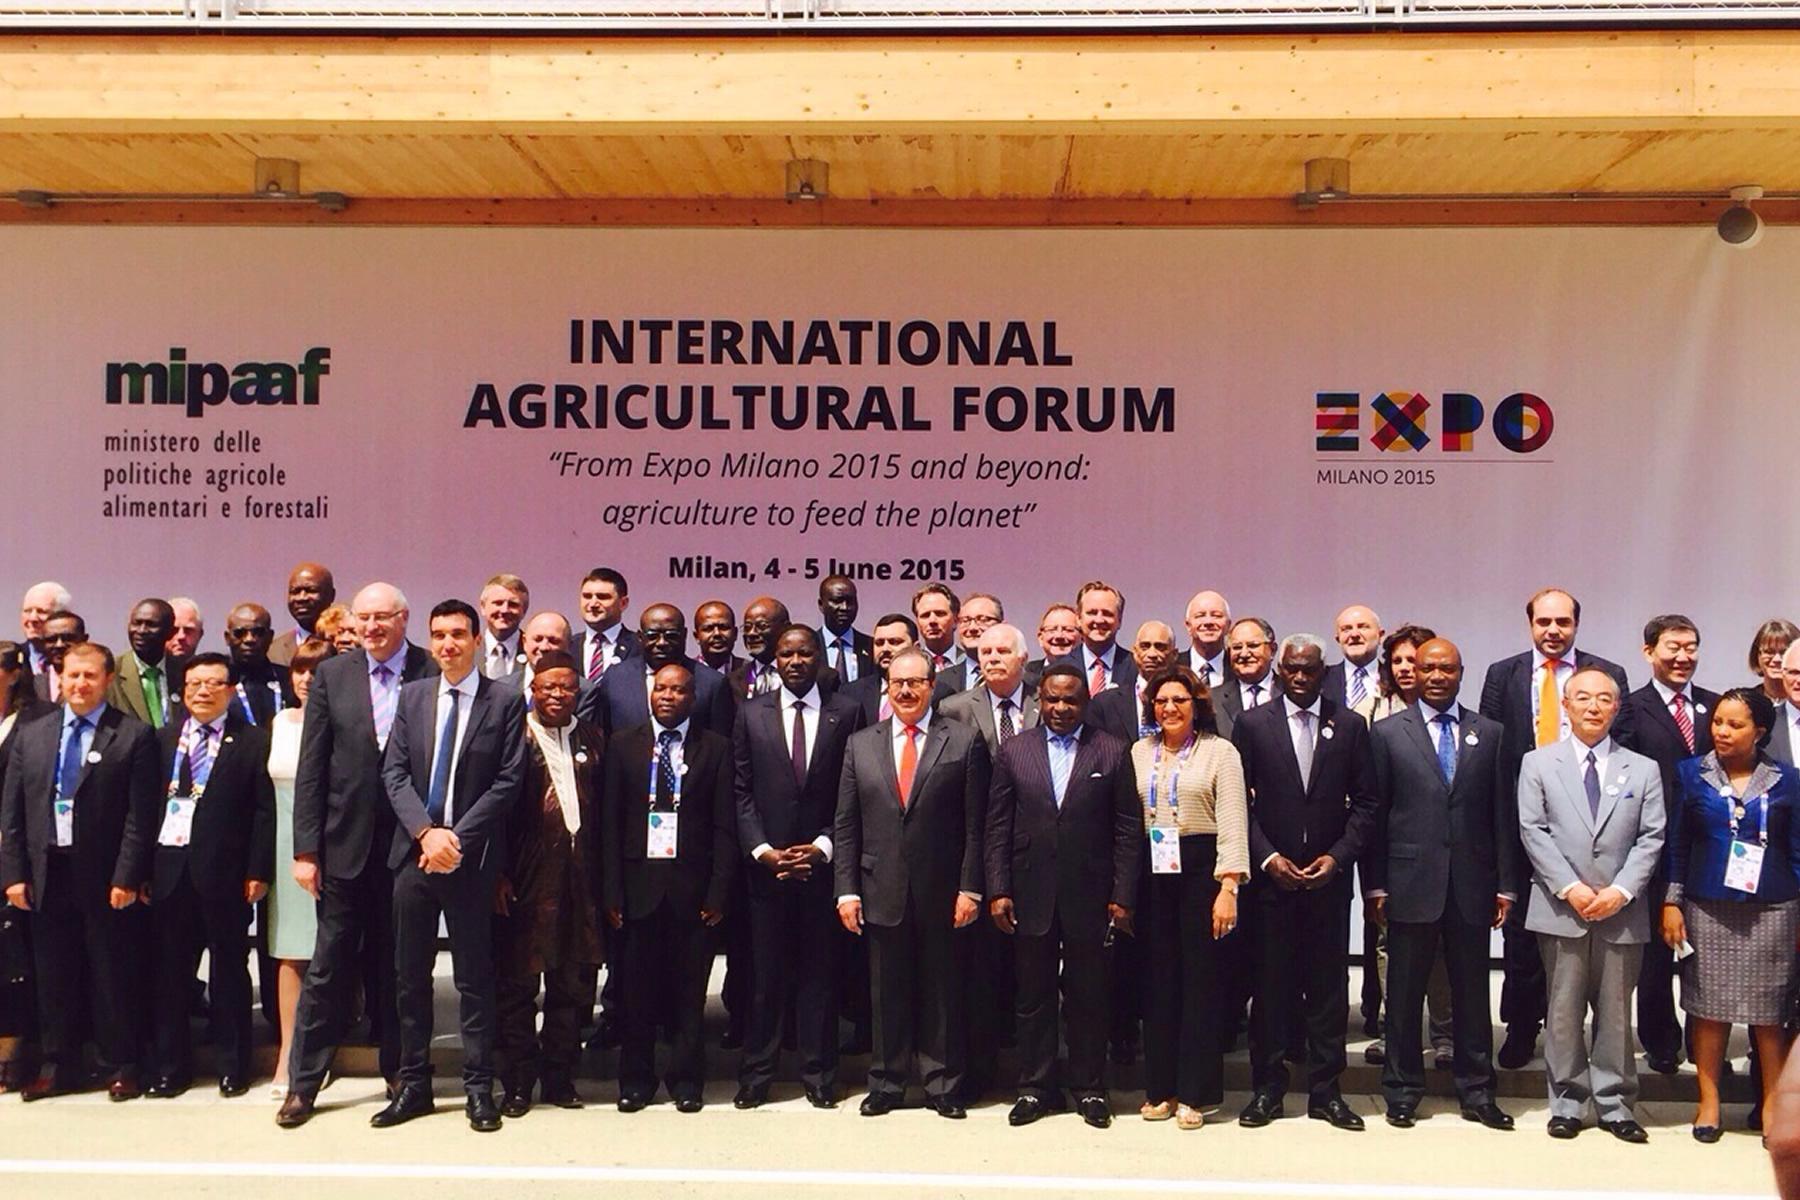 Ciencia e innovación tecnológica aplicadas con responsabilidad, claves en la producción de alimentos a nivel mundial: EMM